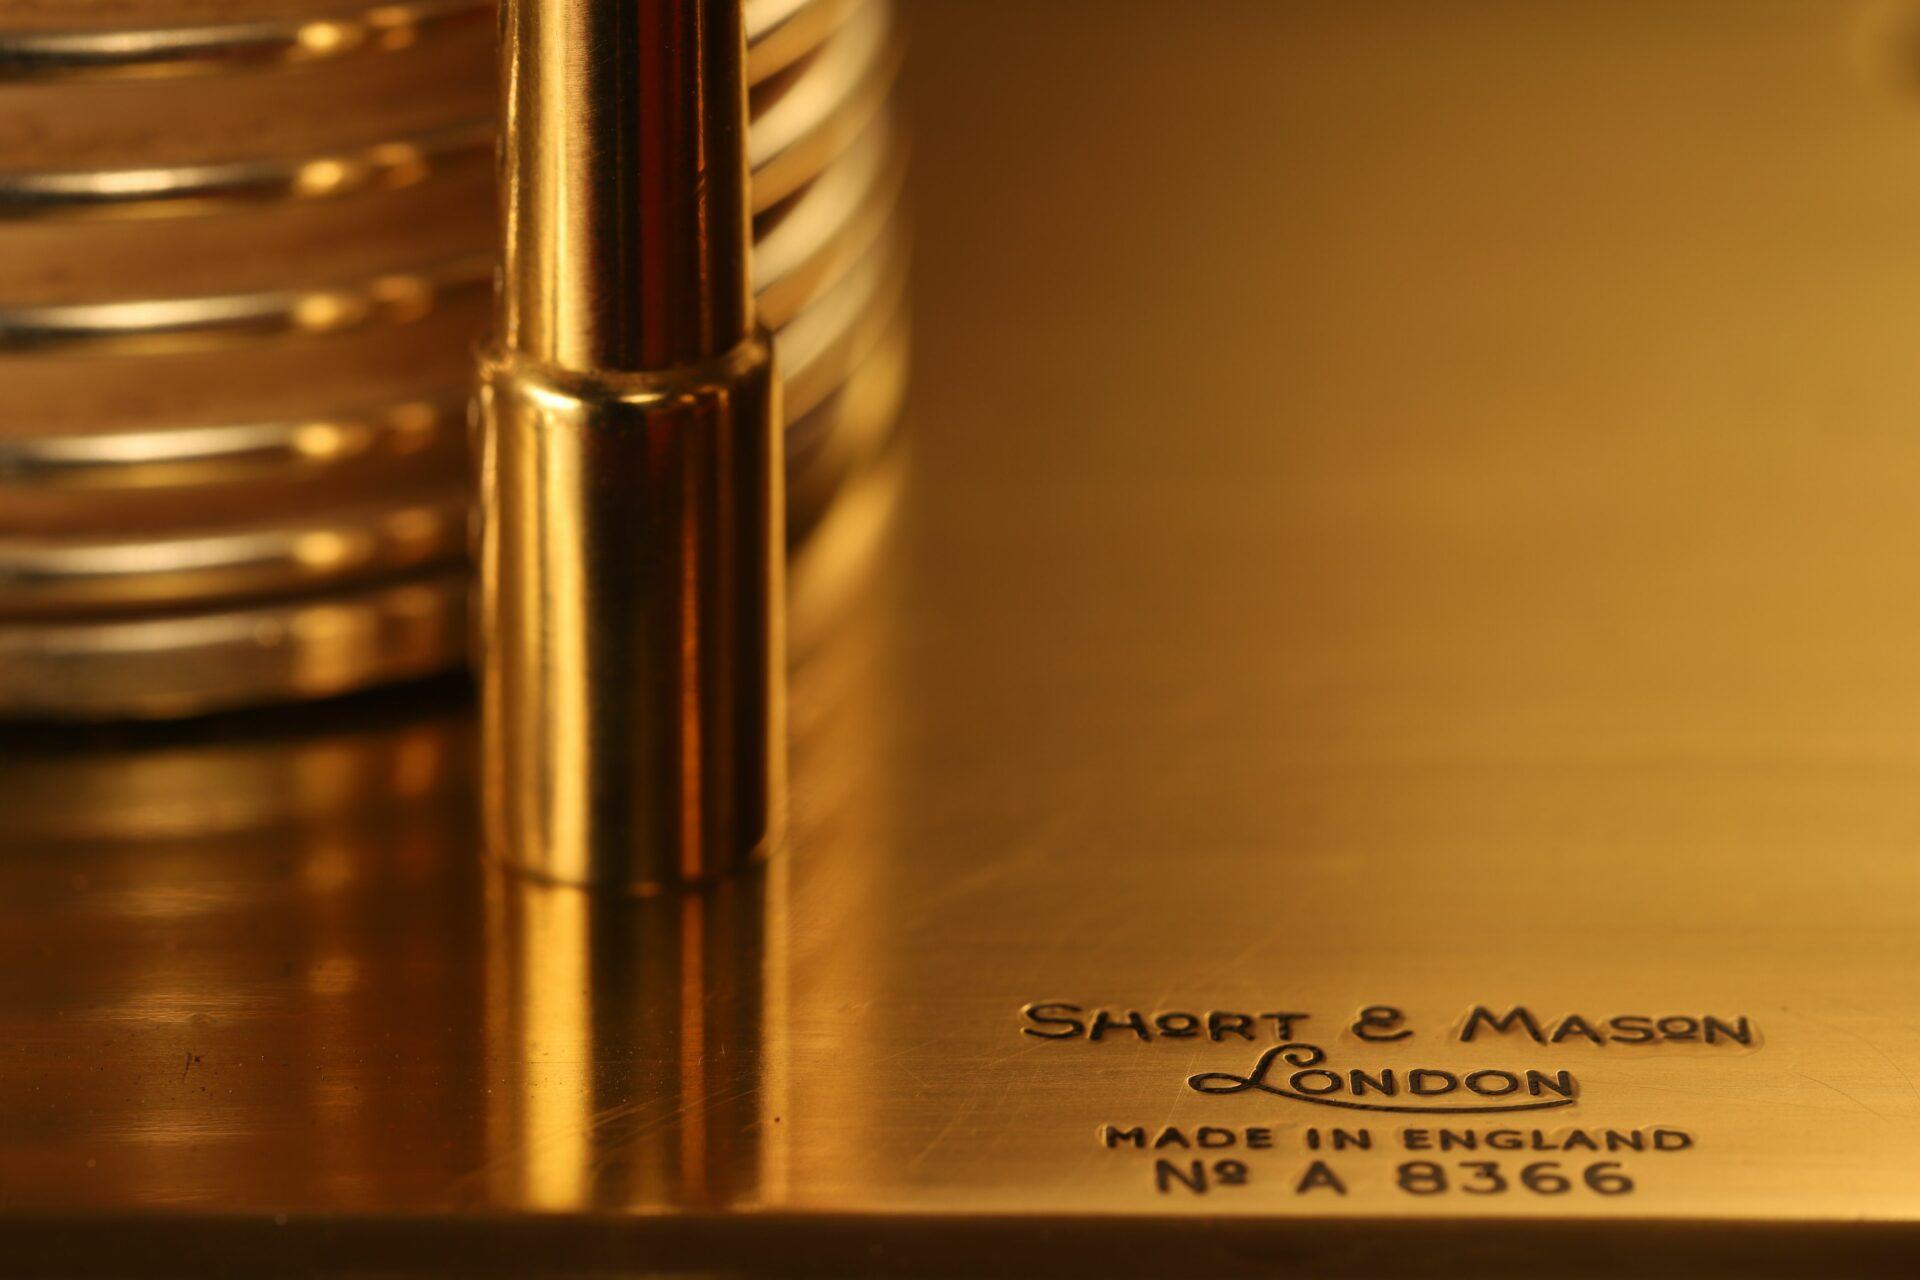 Close up of maker's details for Short & Mason Barothermograph No A 8366